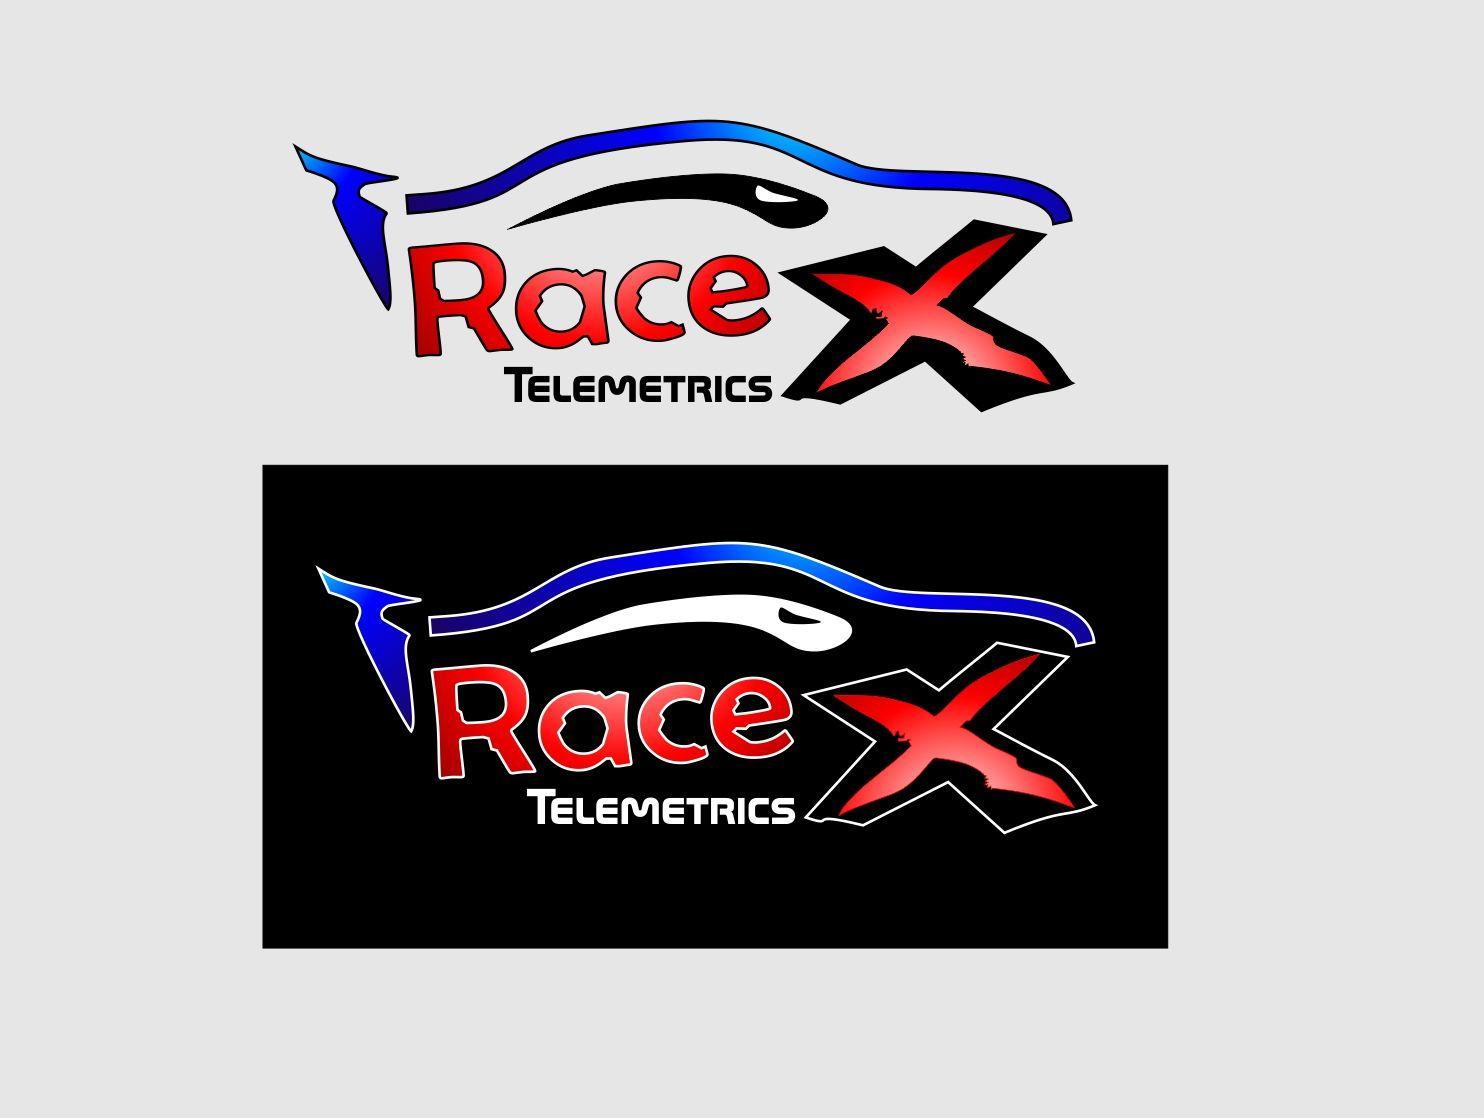 Логотип RaceX Telemetrics  - дизайнер sqwartl